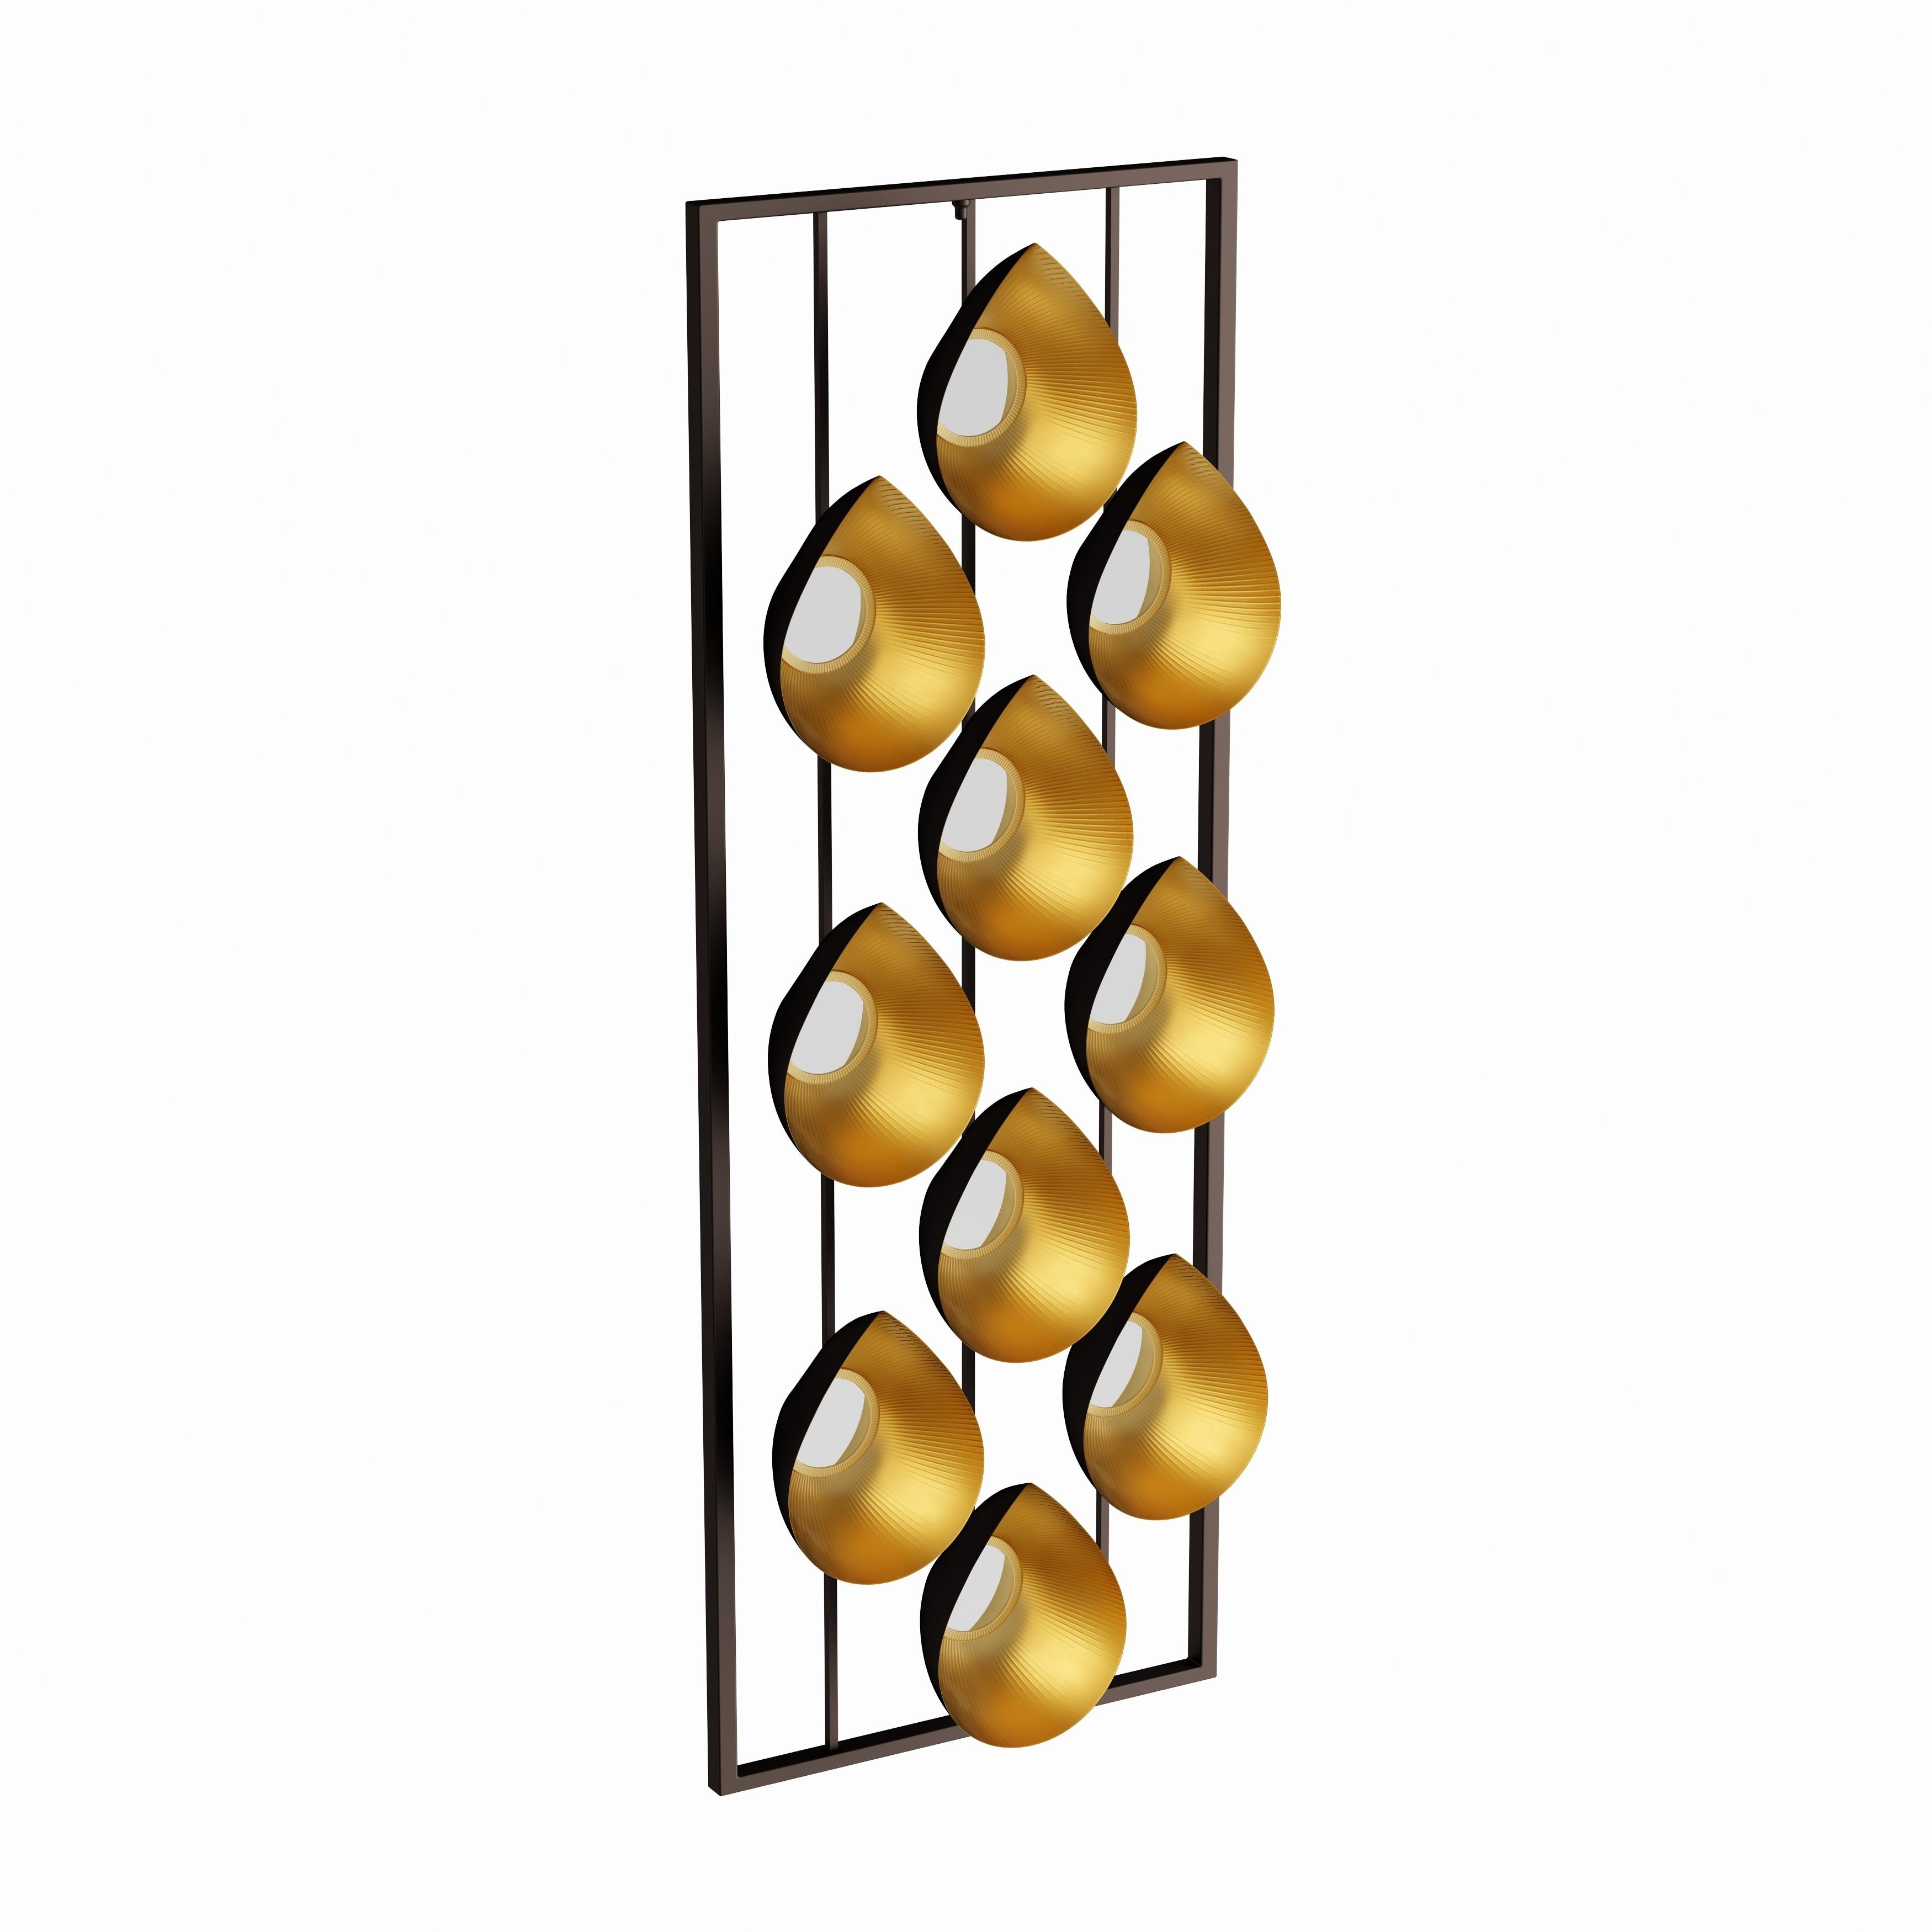 Studio 350 Appealing Metal Mirror Wall Panel (Mirror), Bl...